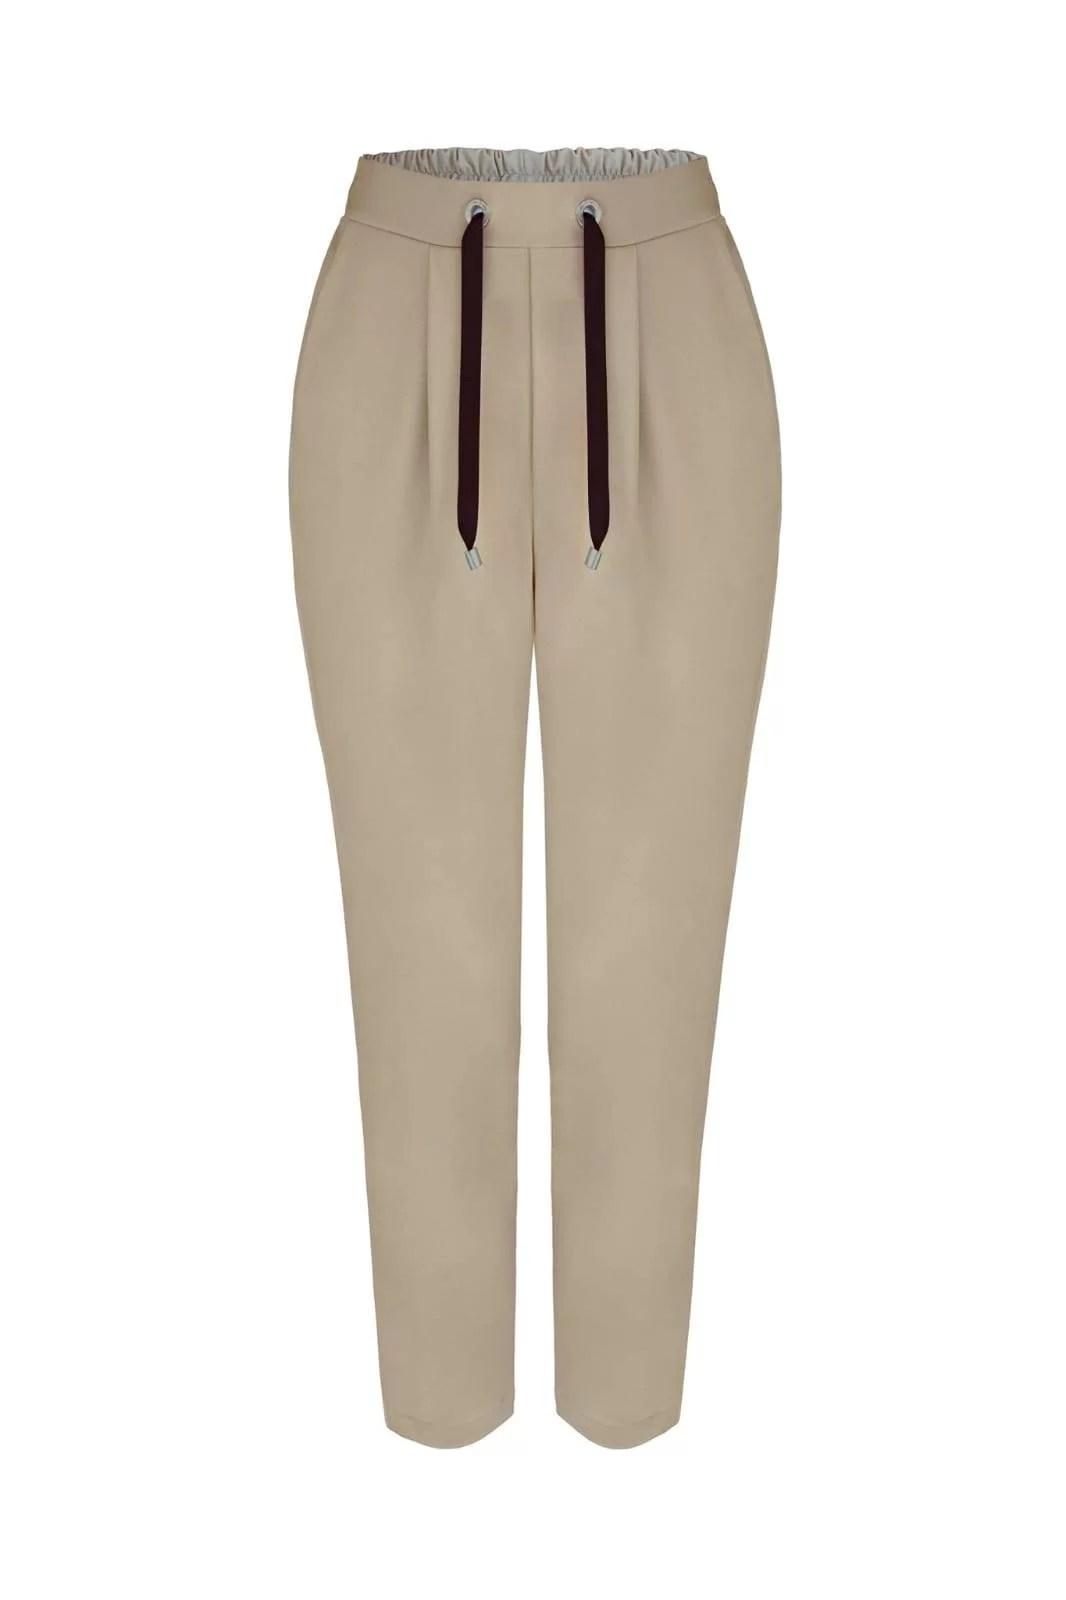 Spodnie Palermo Beż